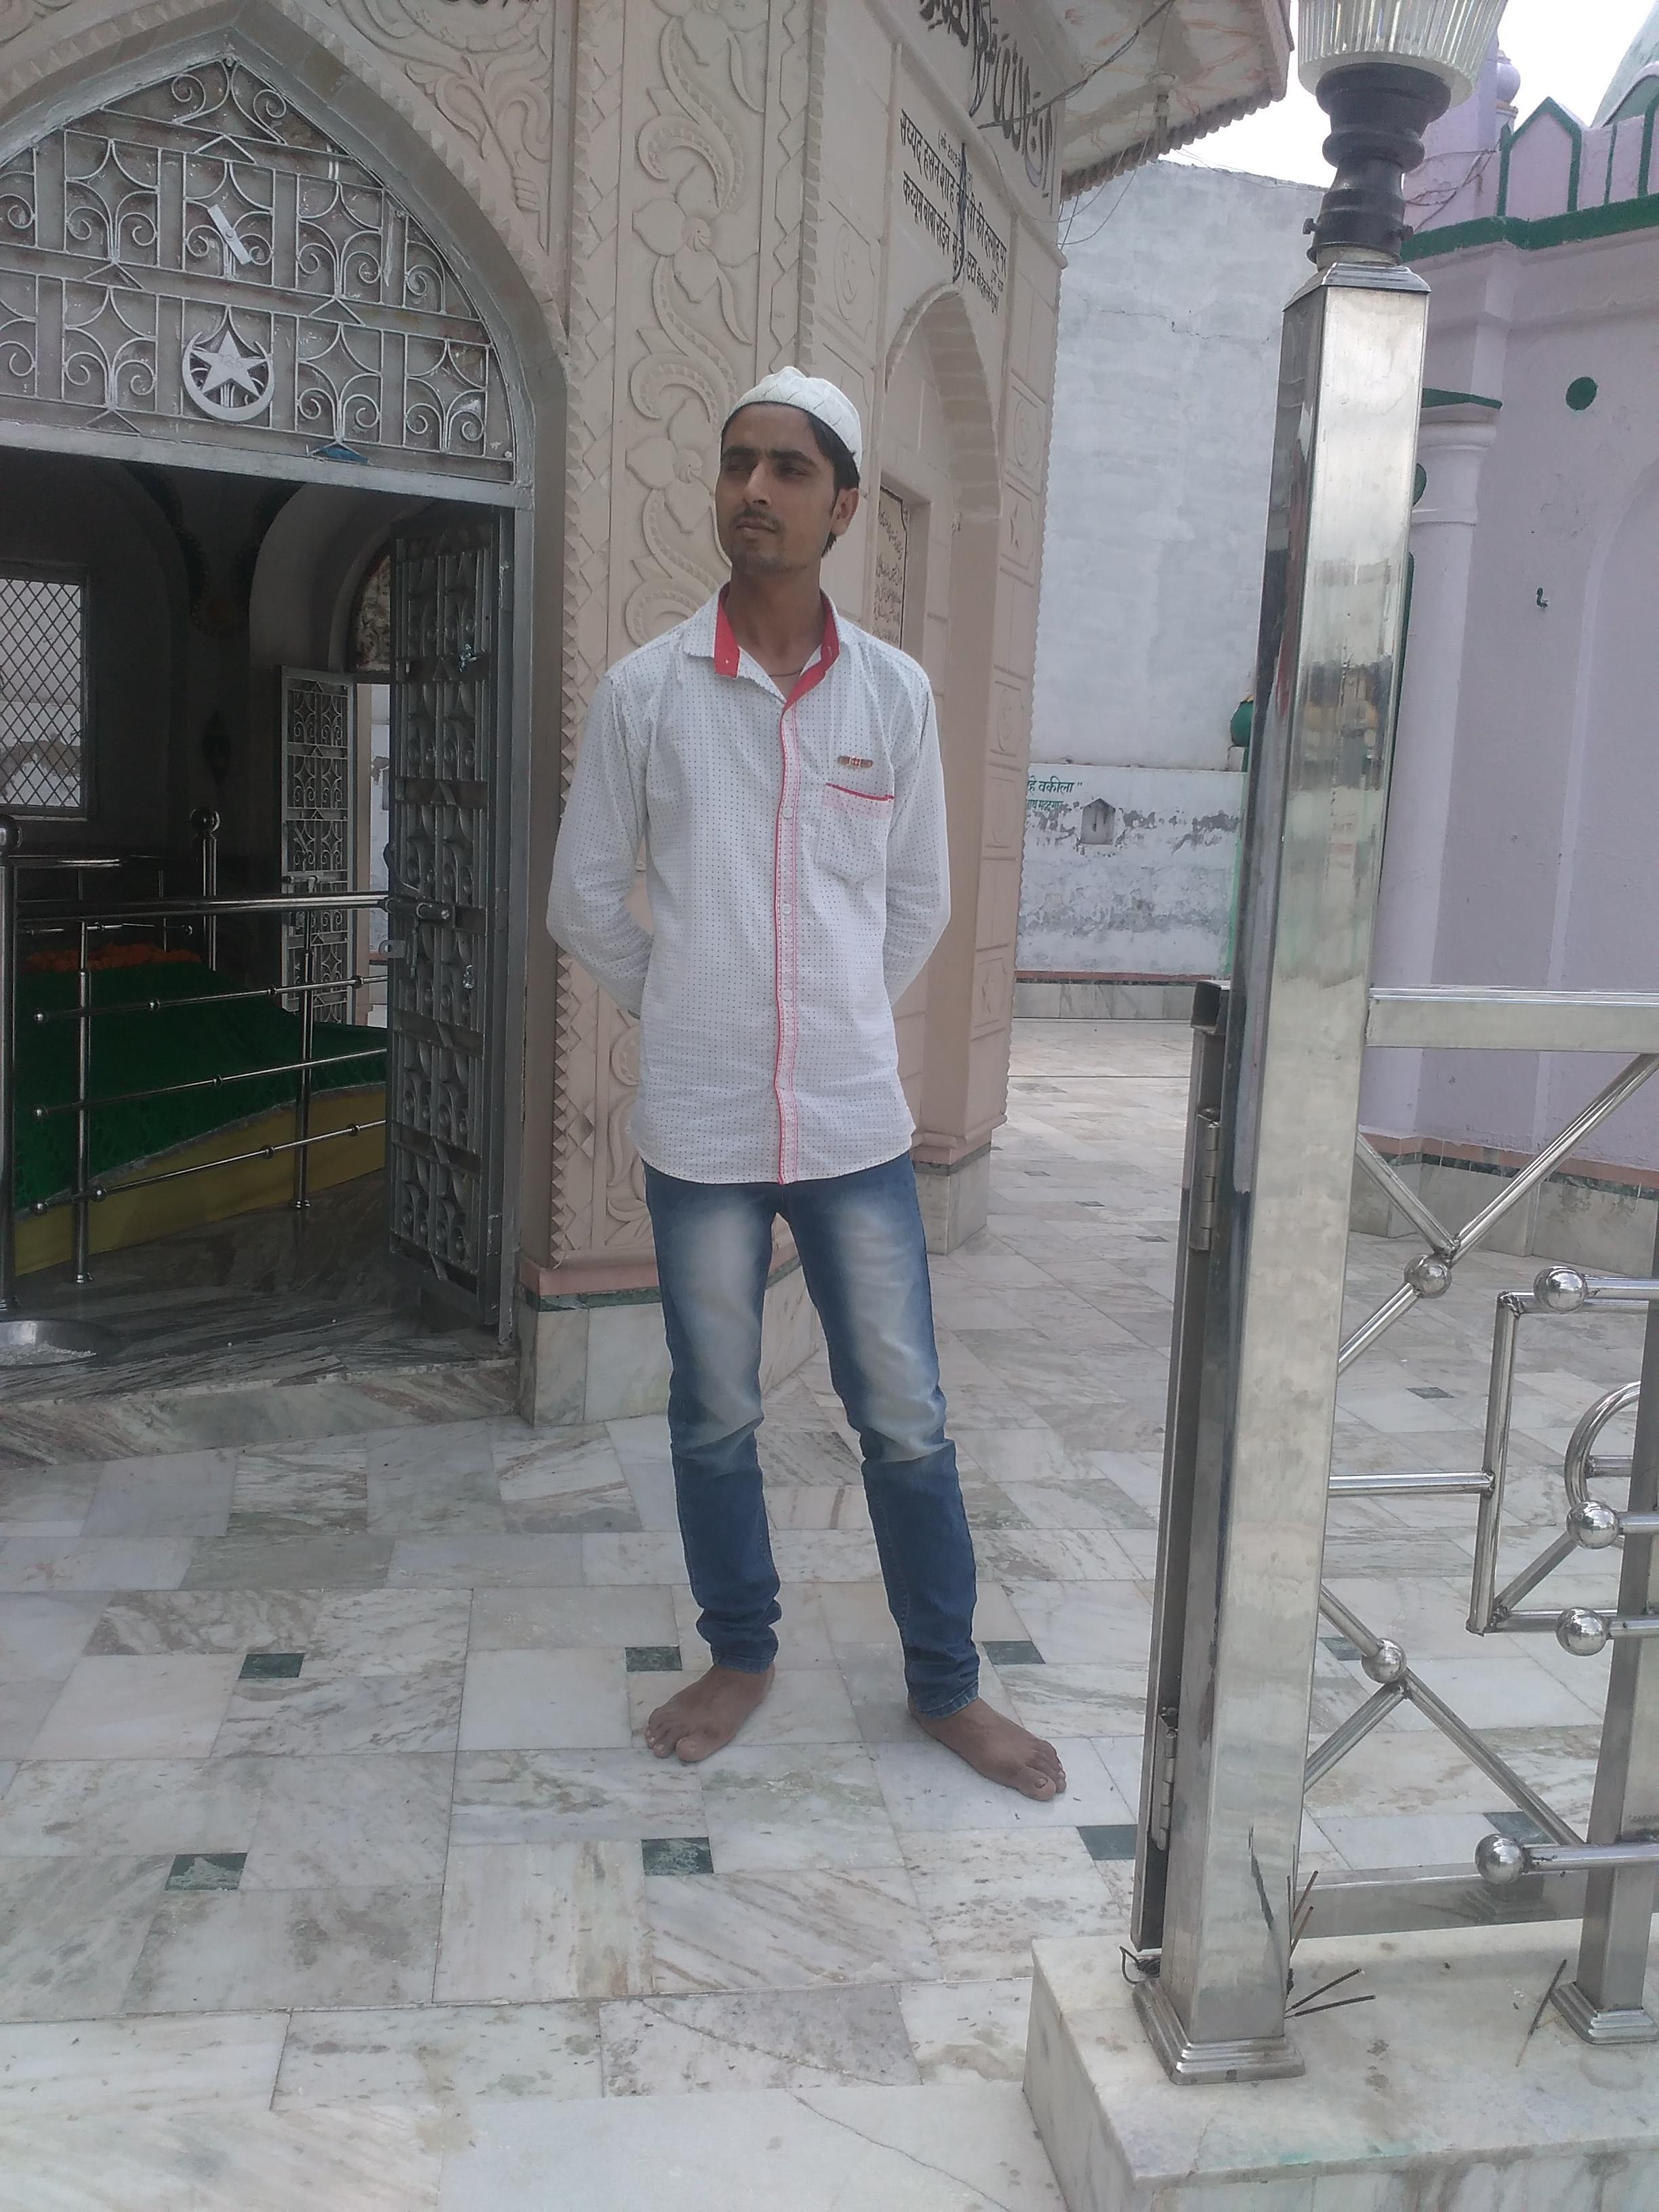 Jahid Beg